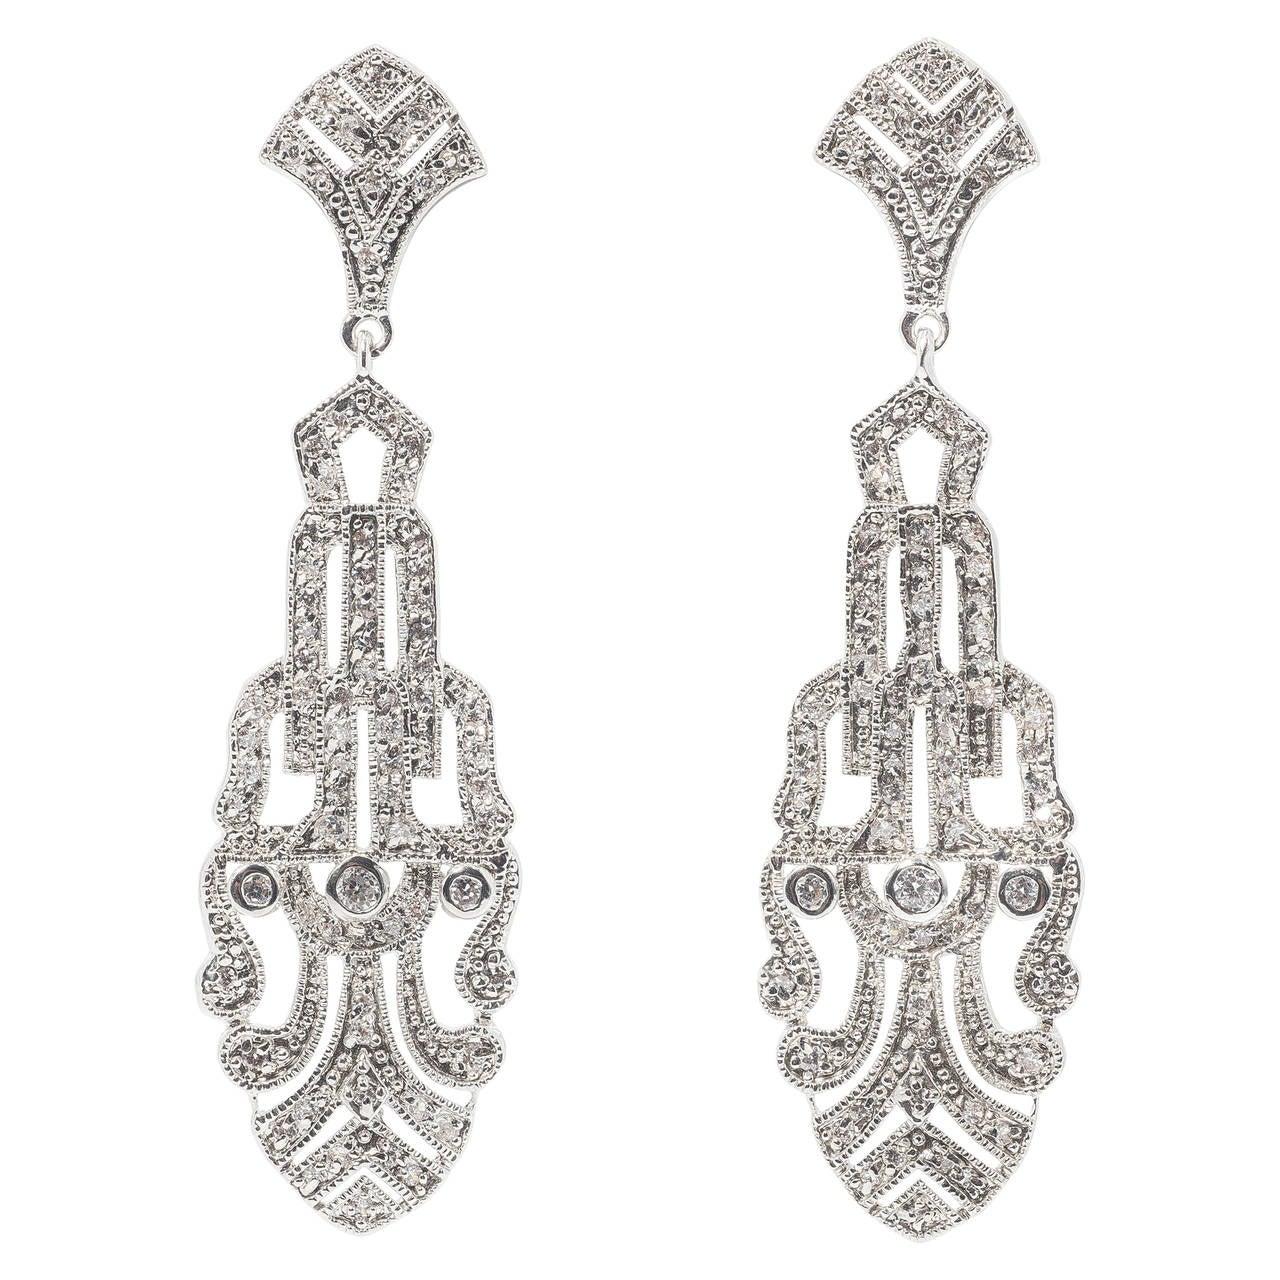 art deco style faux palmette diamond chandelier earrings. Black Bedroom Furniture Sets. Home Design Ideas